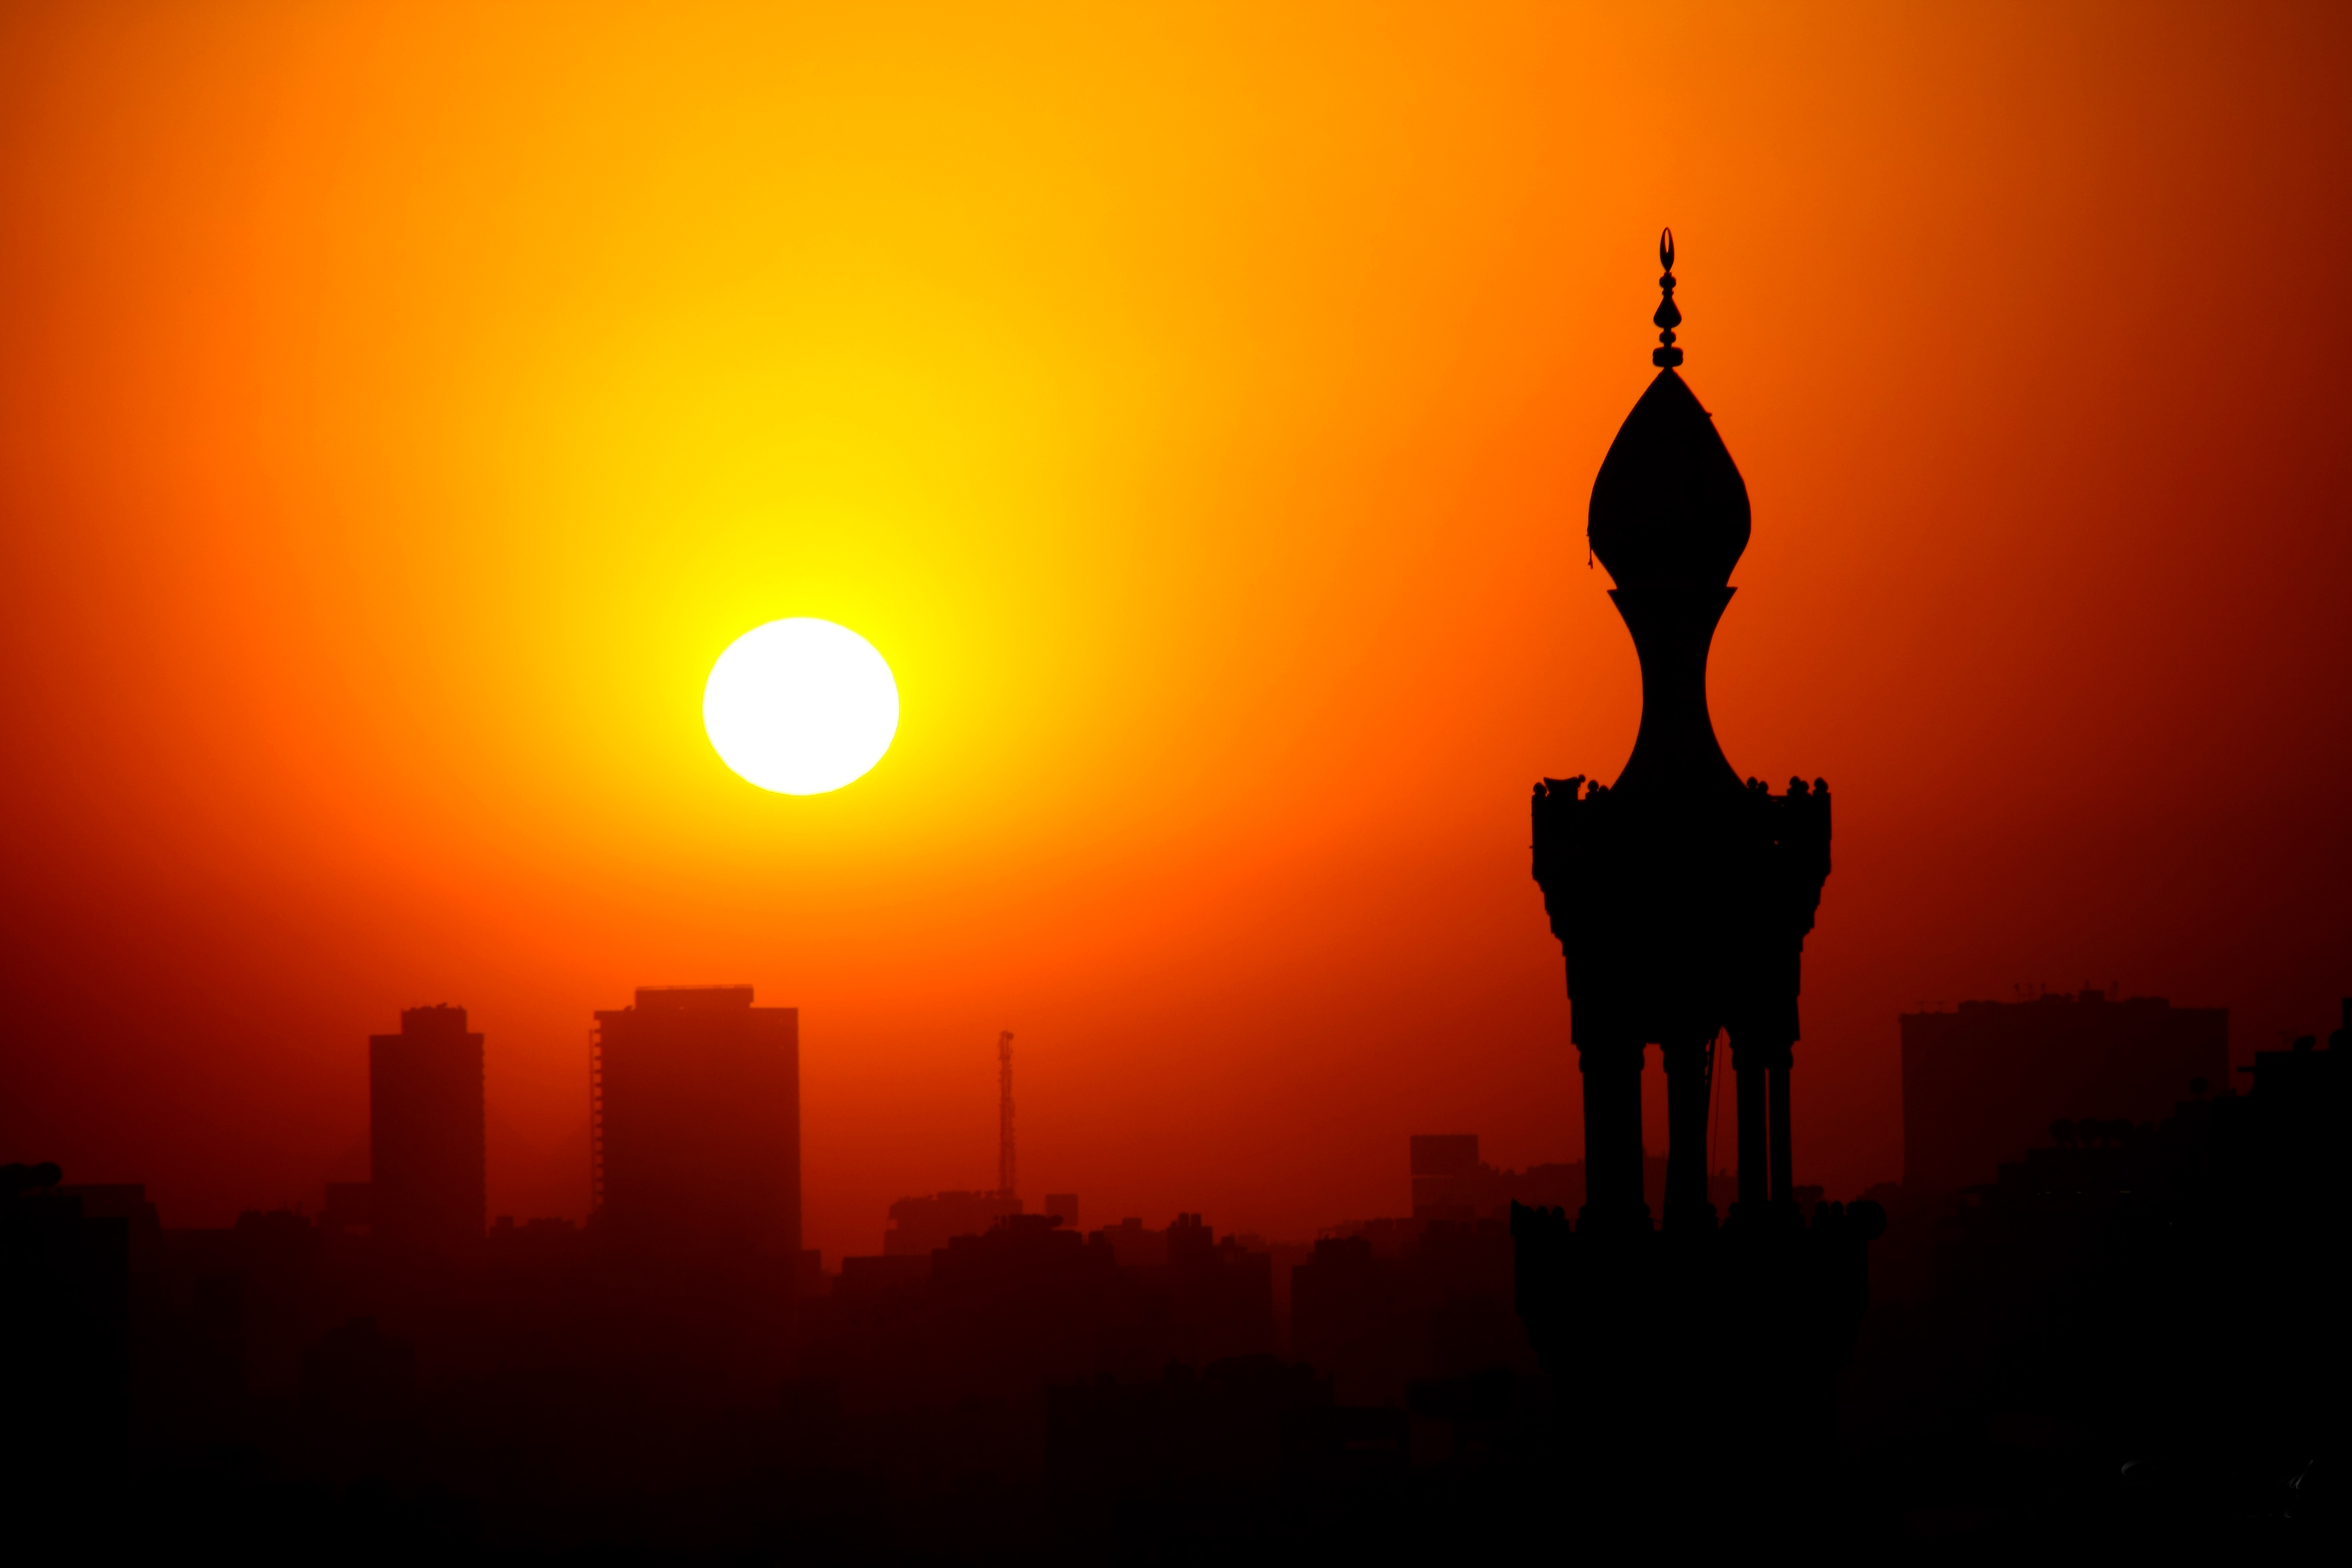 islam_by_khaled_etman-d35n1ra.jpg